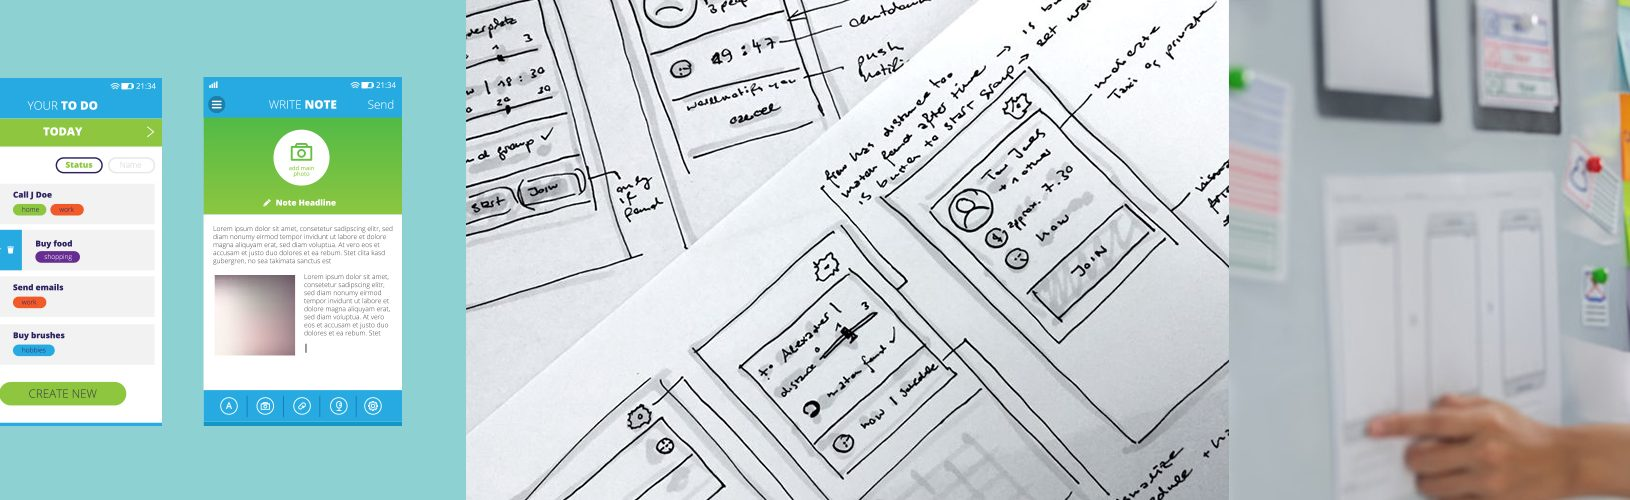 Formation Alternance en UX Design et UI Design Paris -WebDesign - Ecole Com'Art Design